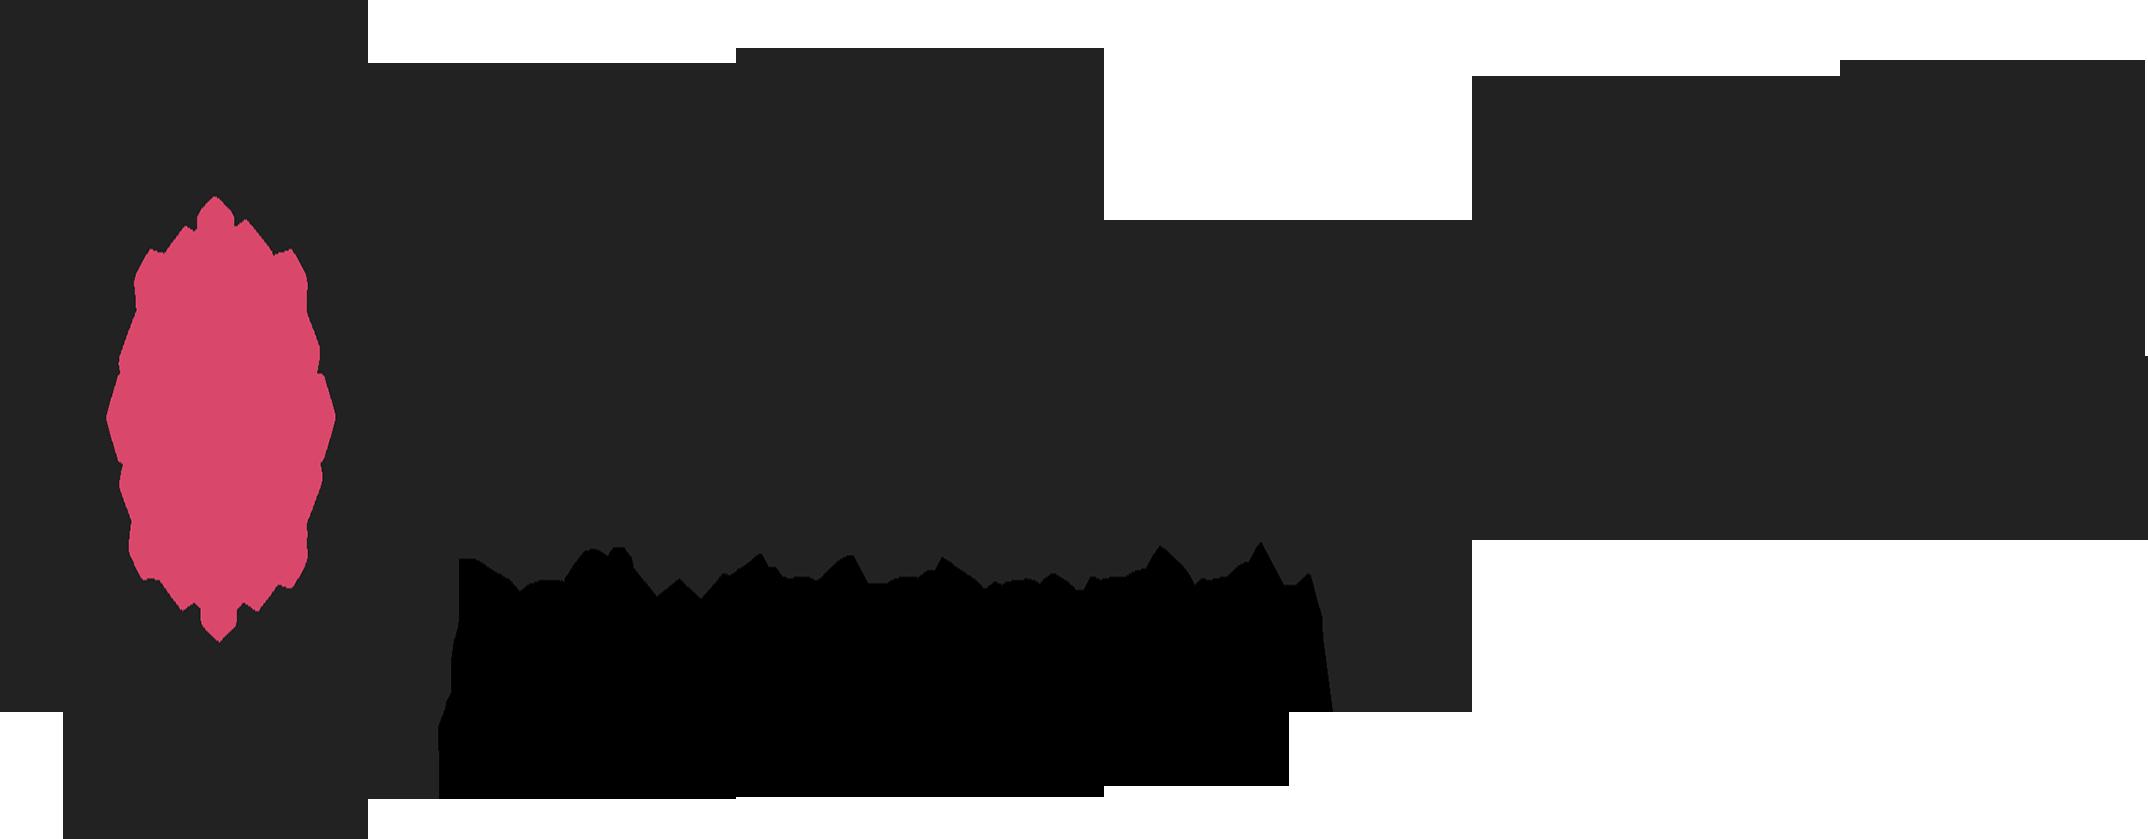 Ubrium Galactic - software company